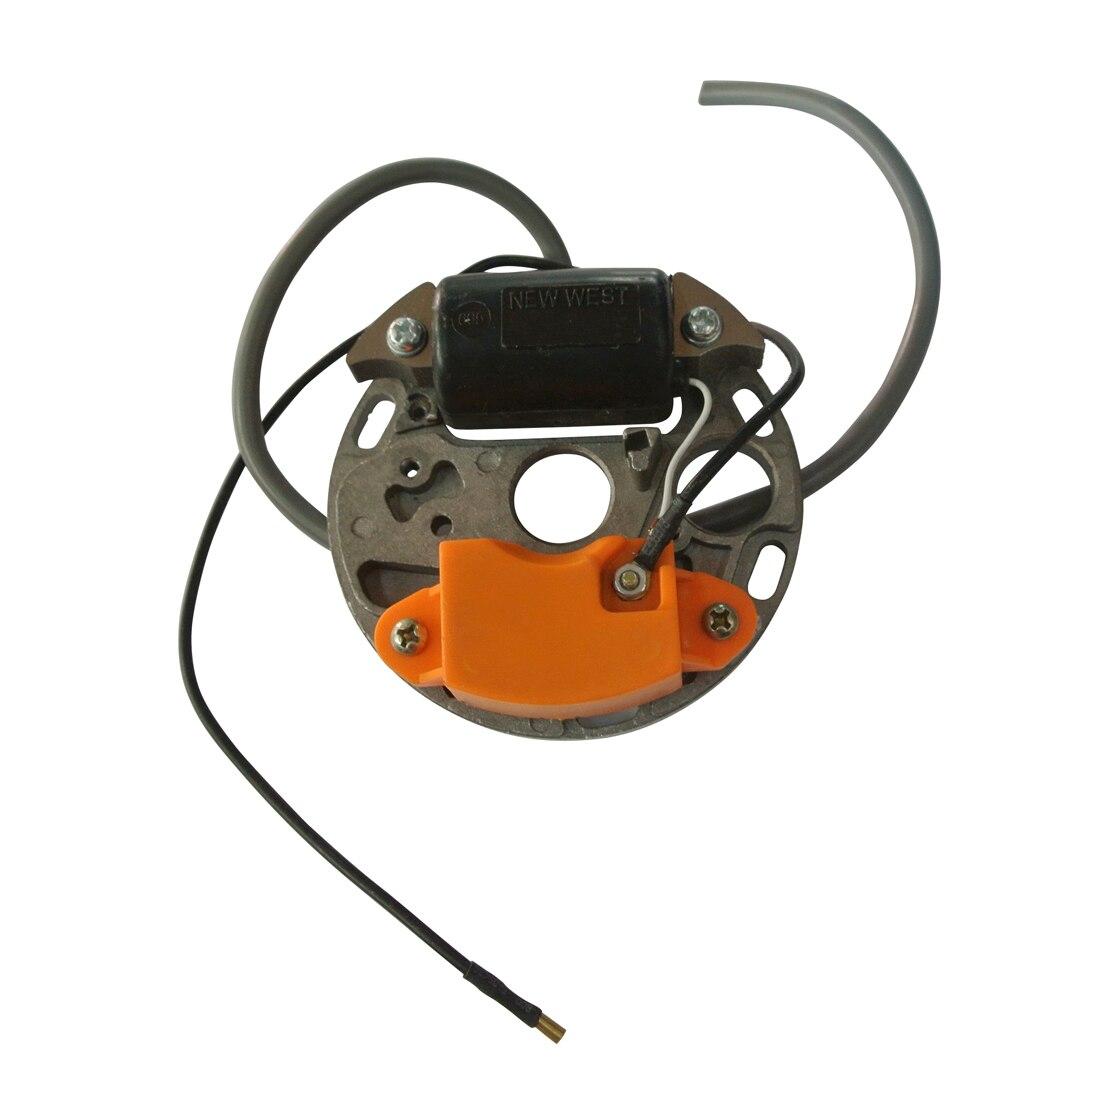 BIG SALE] Ignition Coil Module for Stihl 070 090 090G